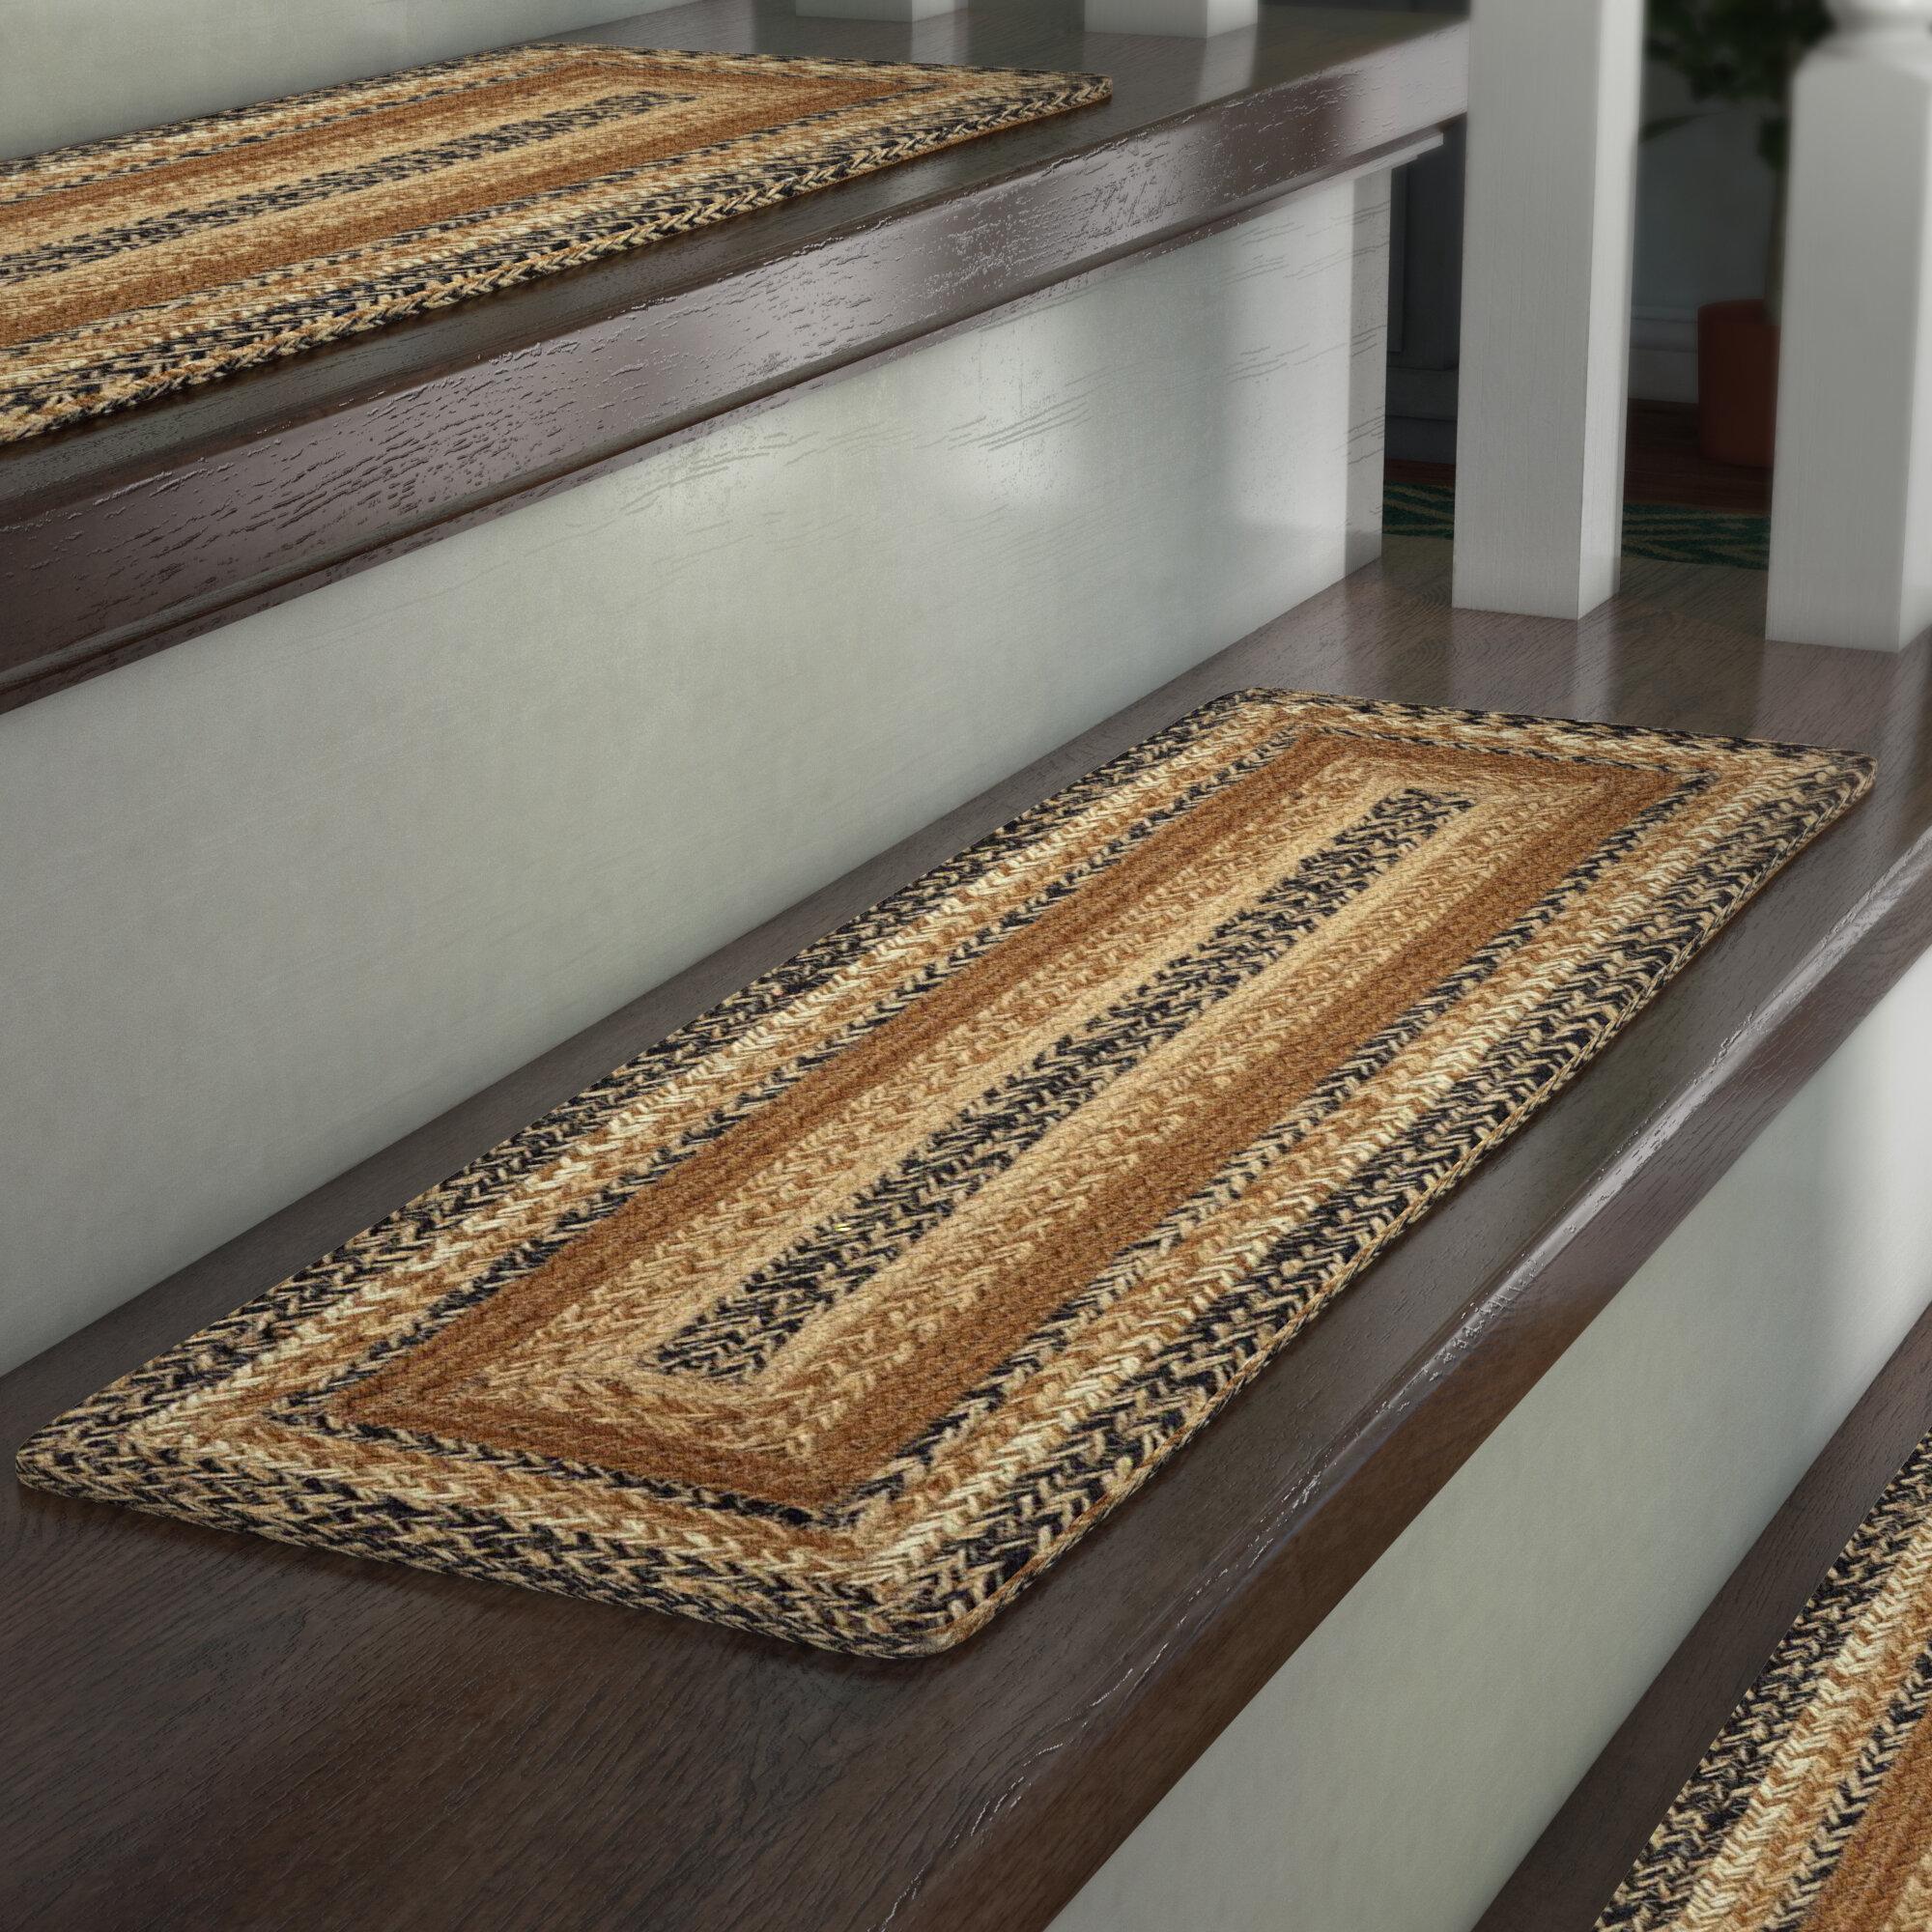 August Grove Millicent Caramel Brown Stair Tread U0026 Reviews | Wayfair